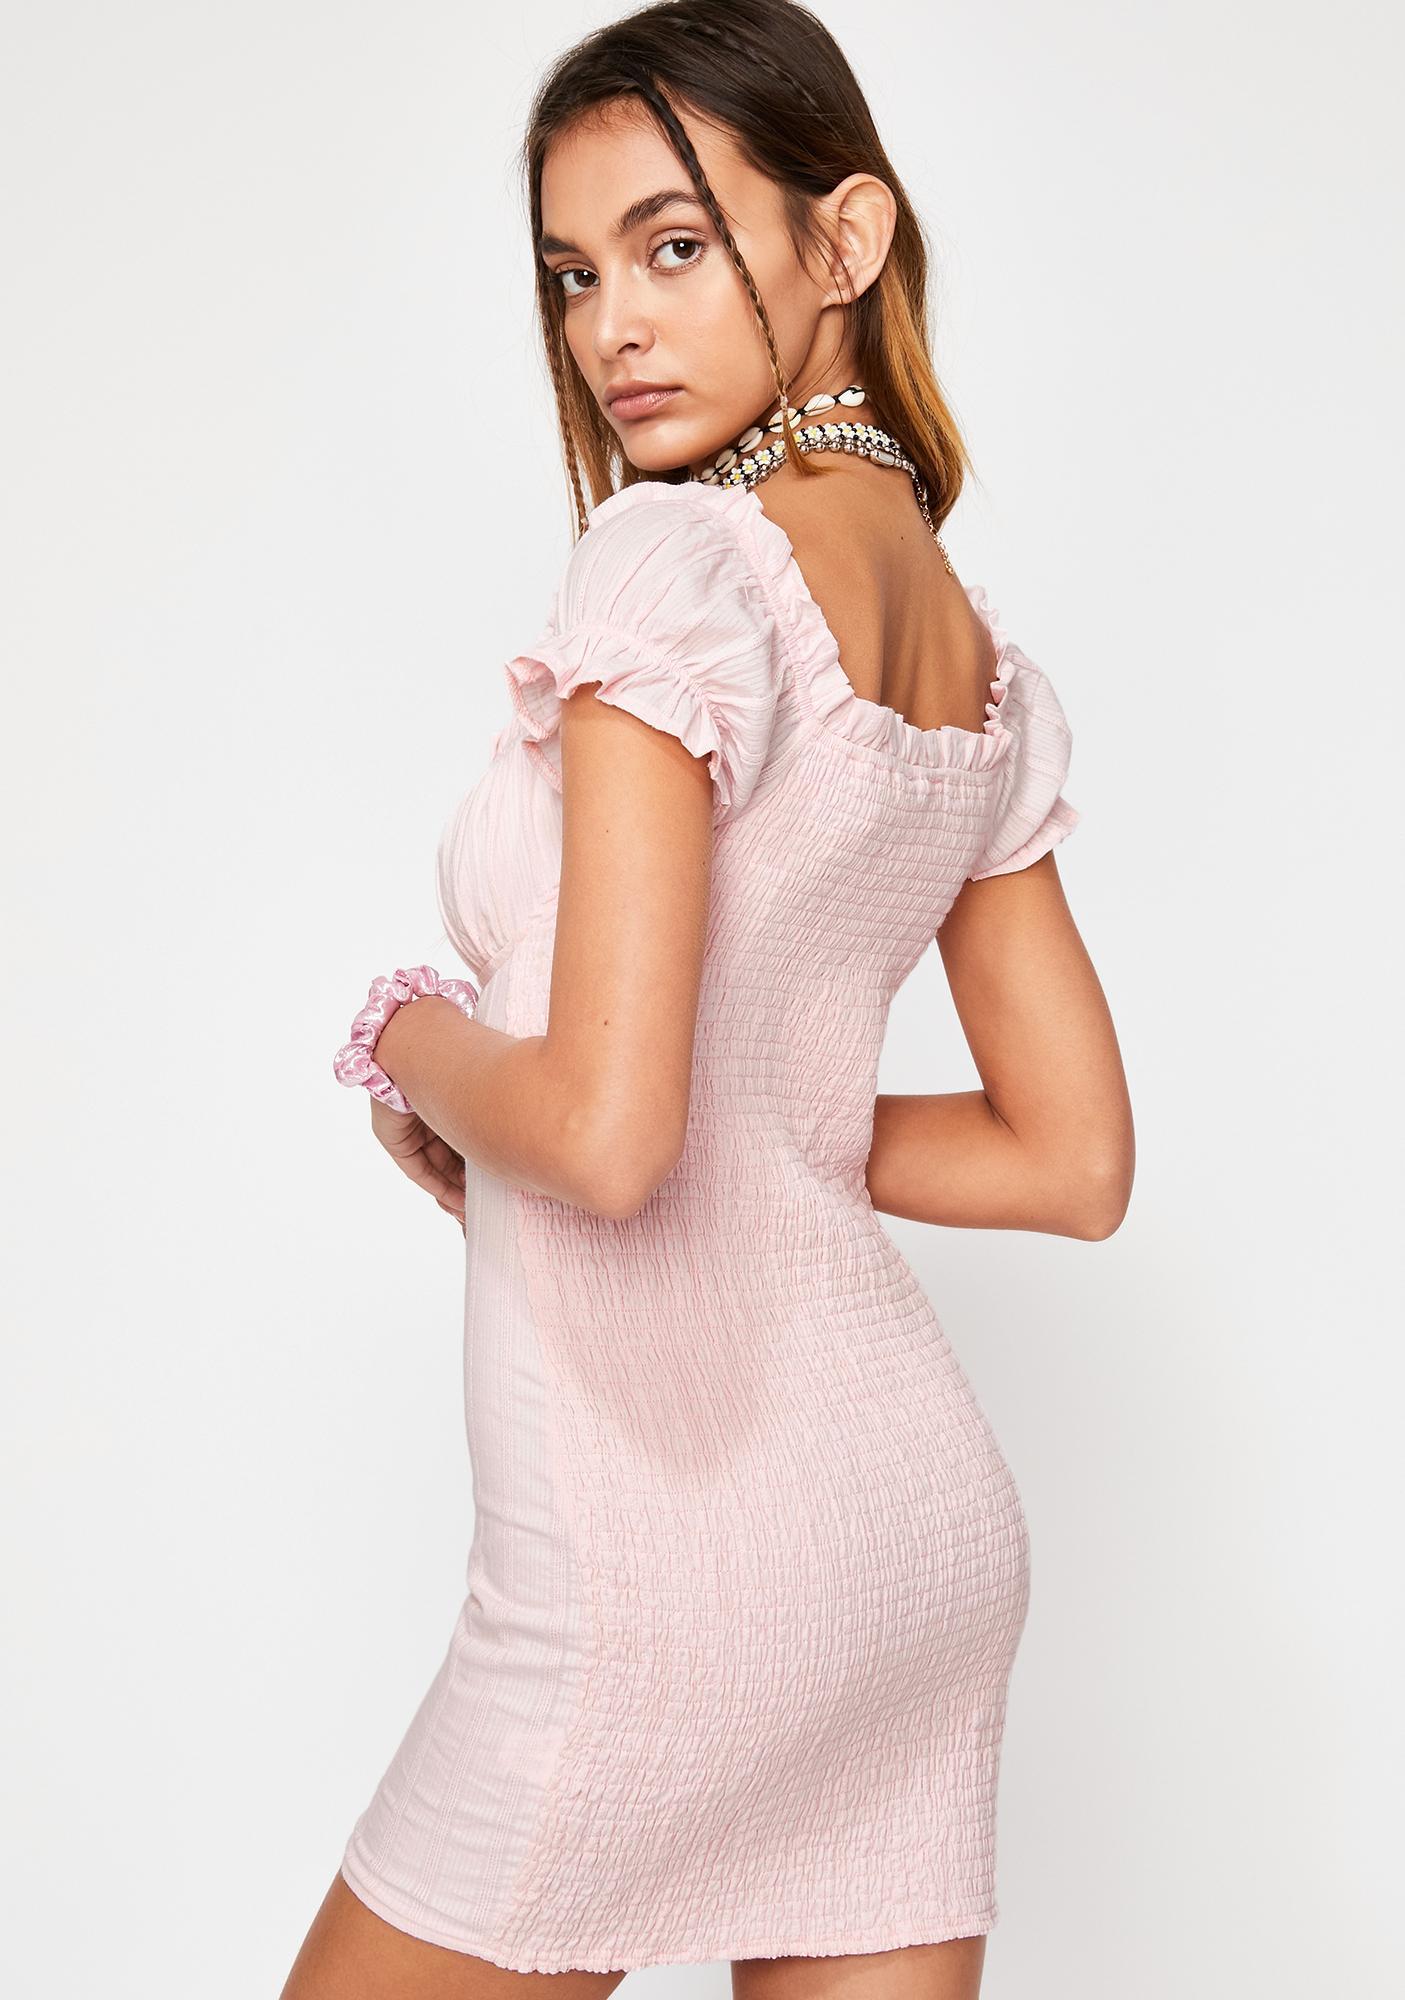 Oh Behave Mini Dress